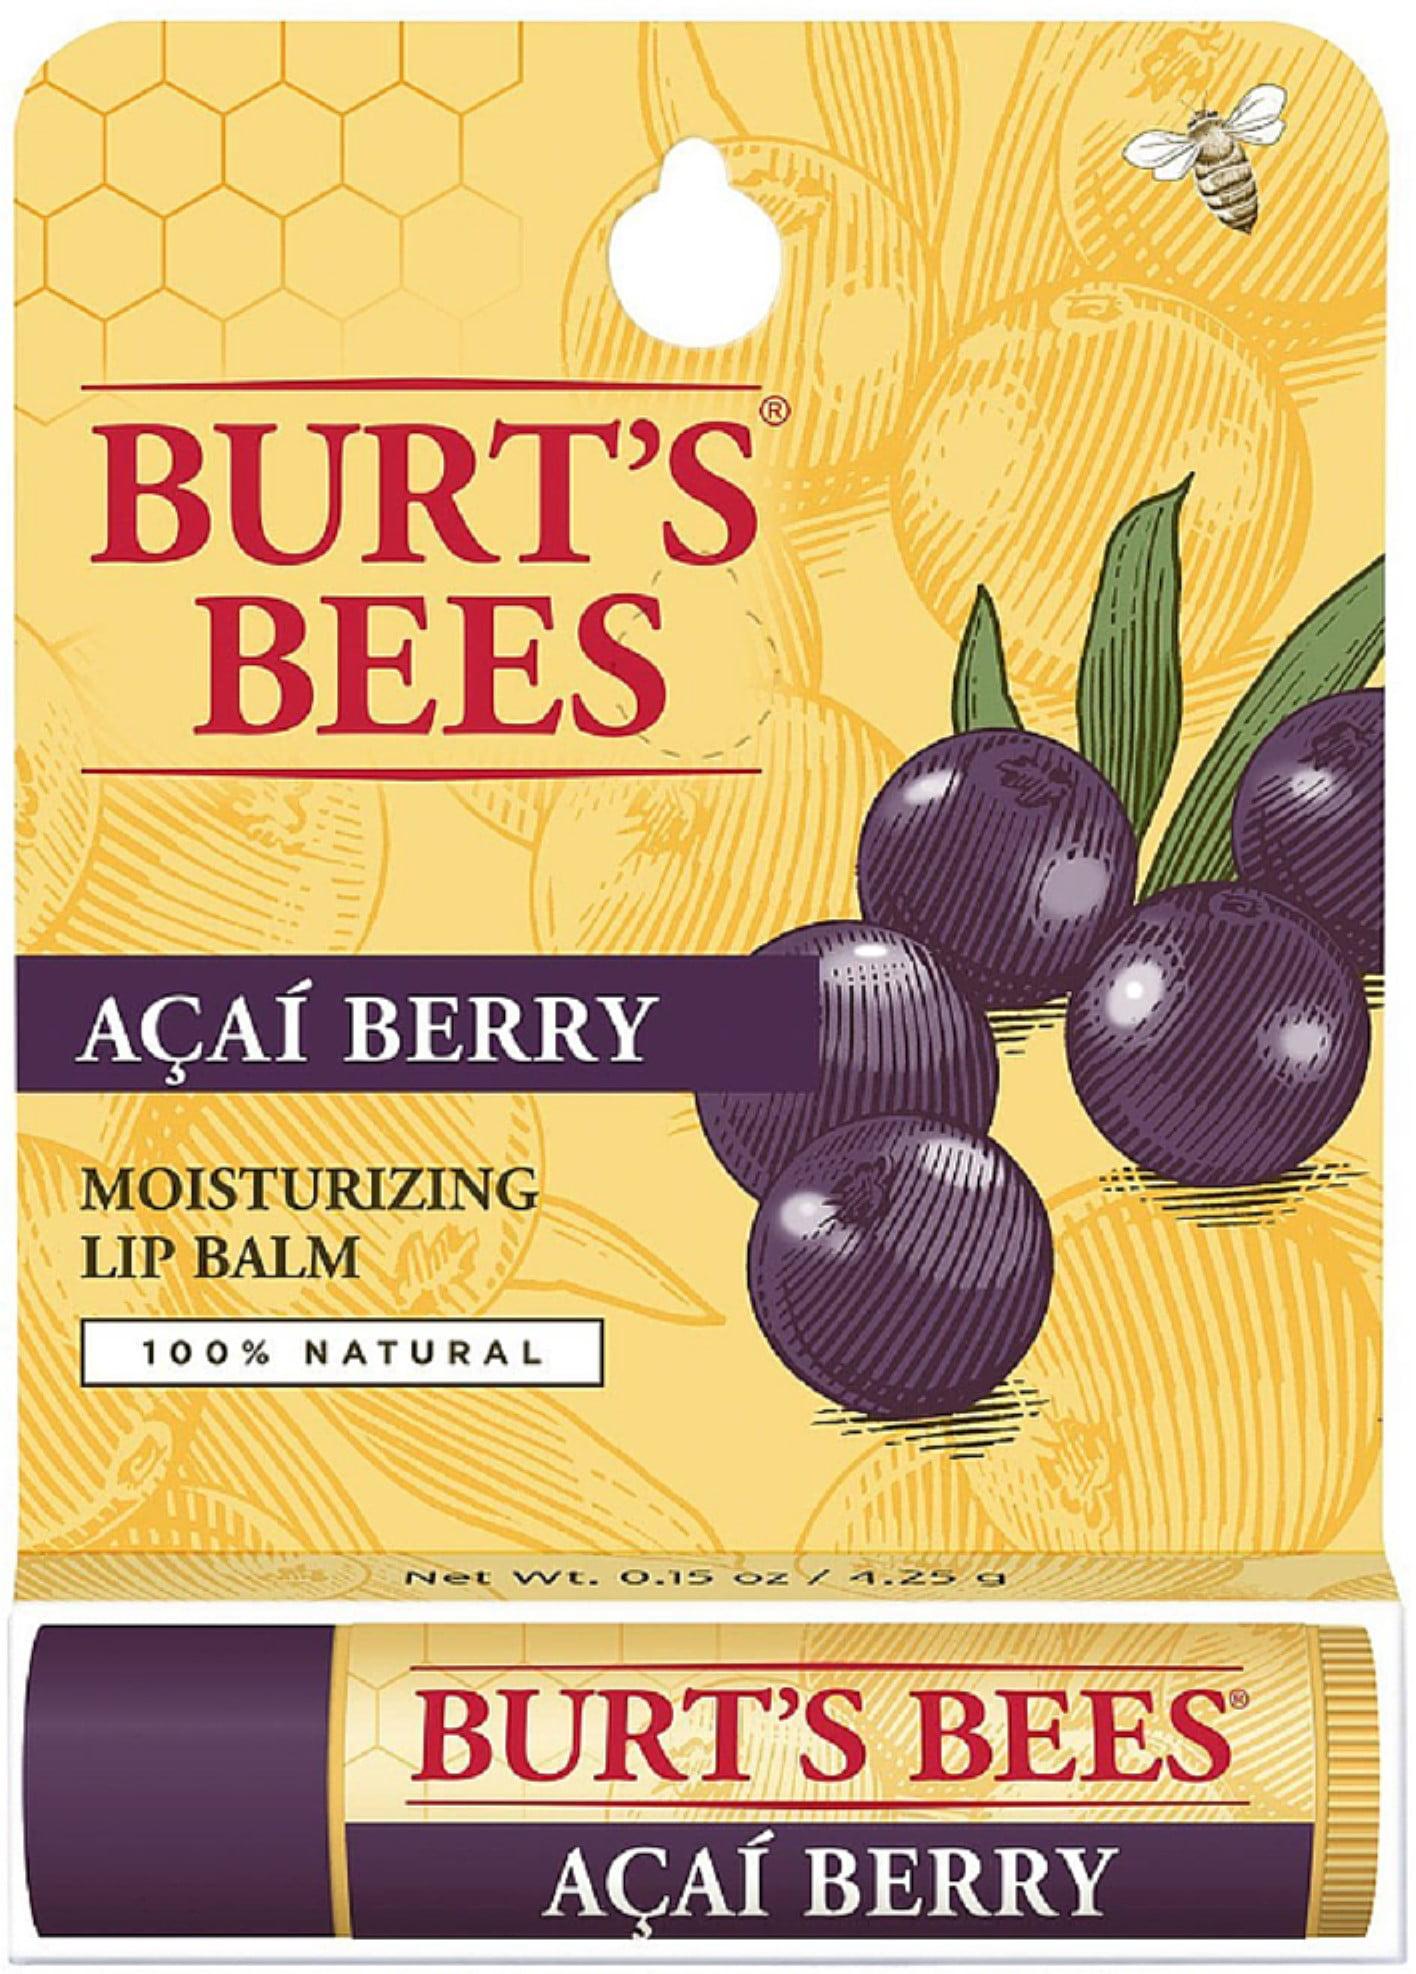 Burt's Bees 100% Natural Rejuvenating Lip Balm, Acai Berry 0.15 oz (Pack of 6)